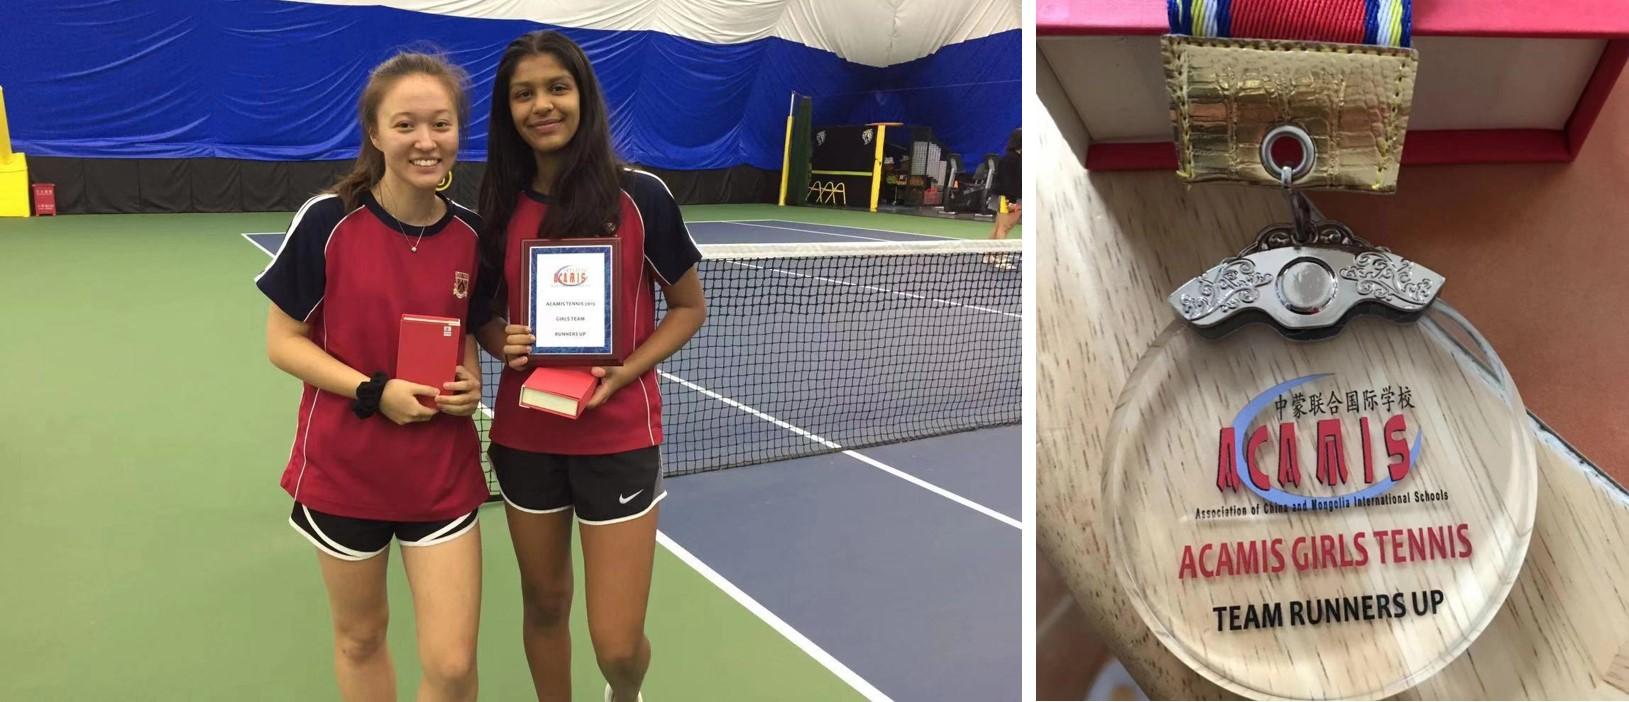 dulwich-u19-tennis-players-at-acamis-tennis-tournament